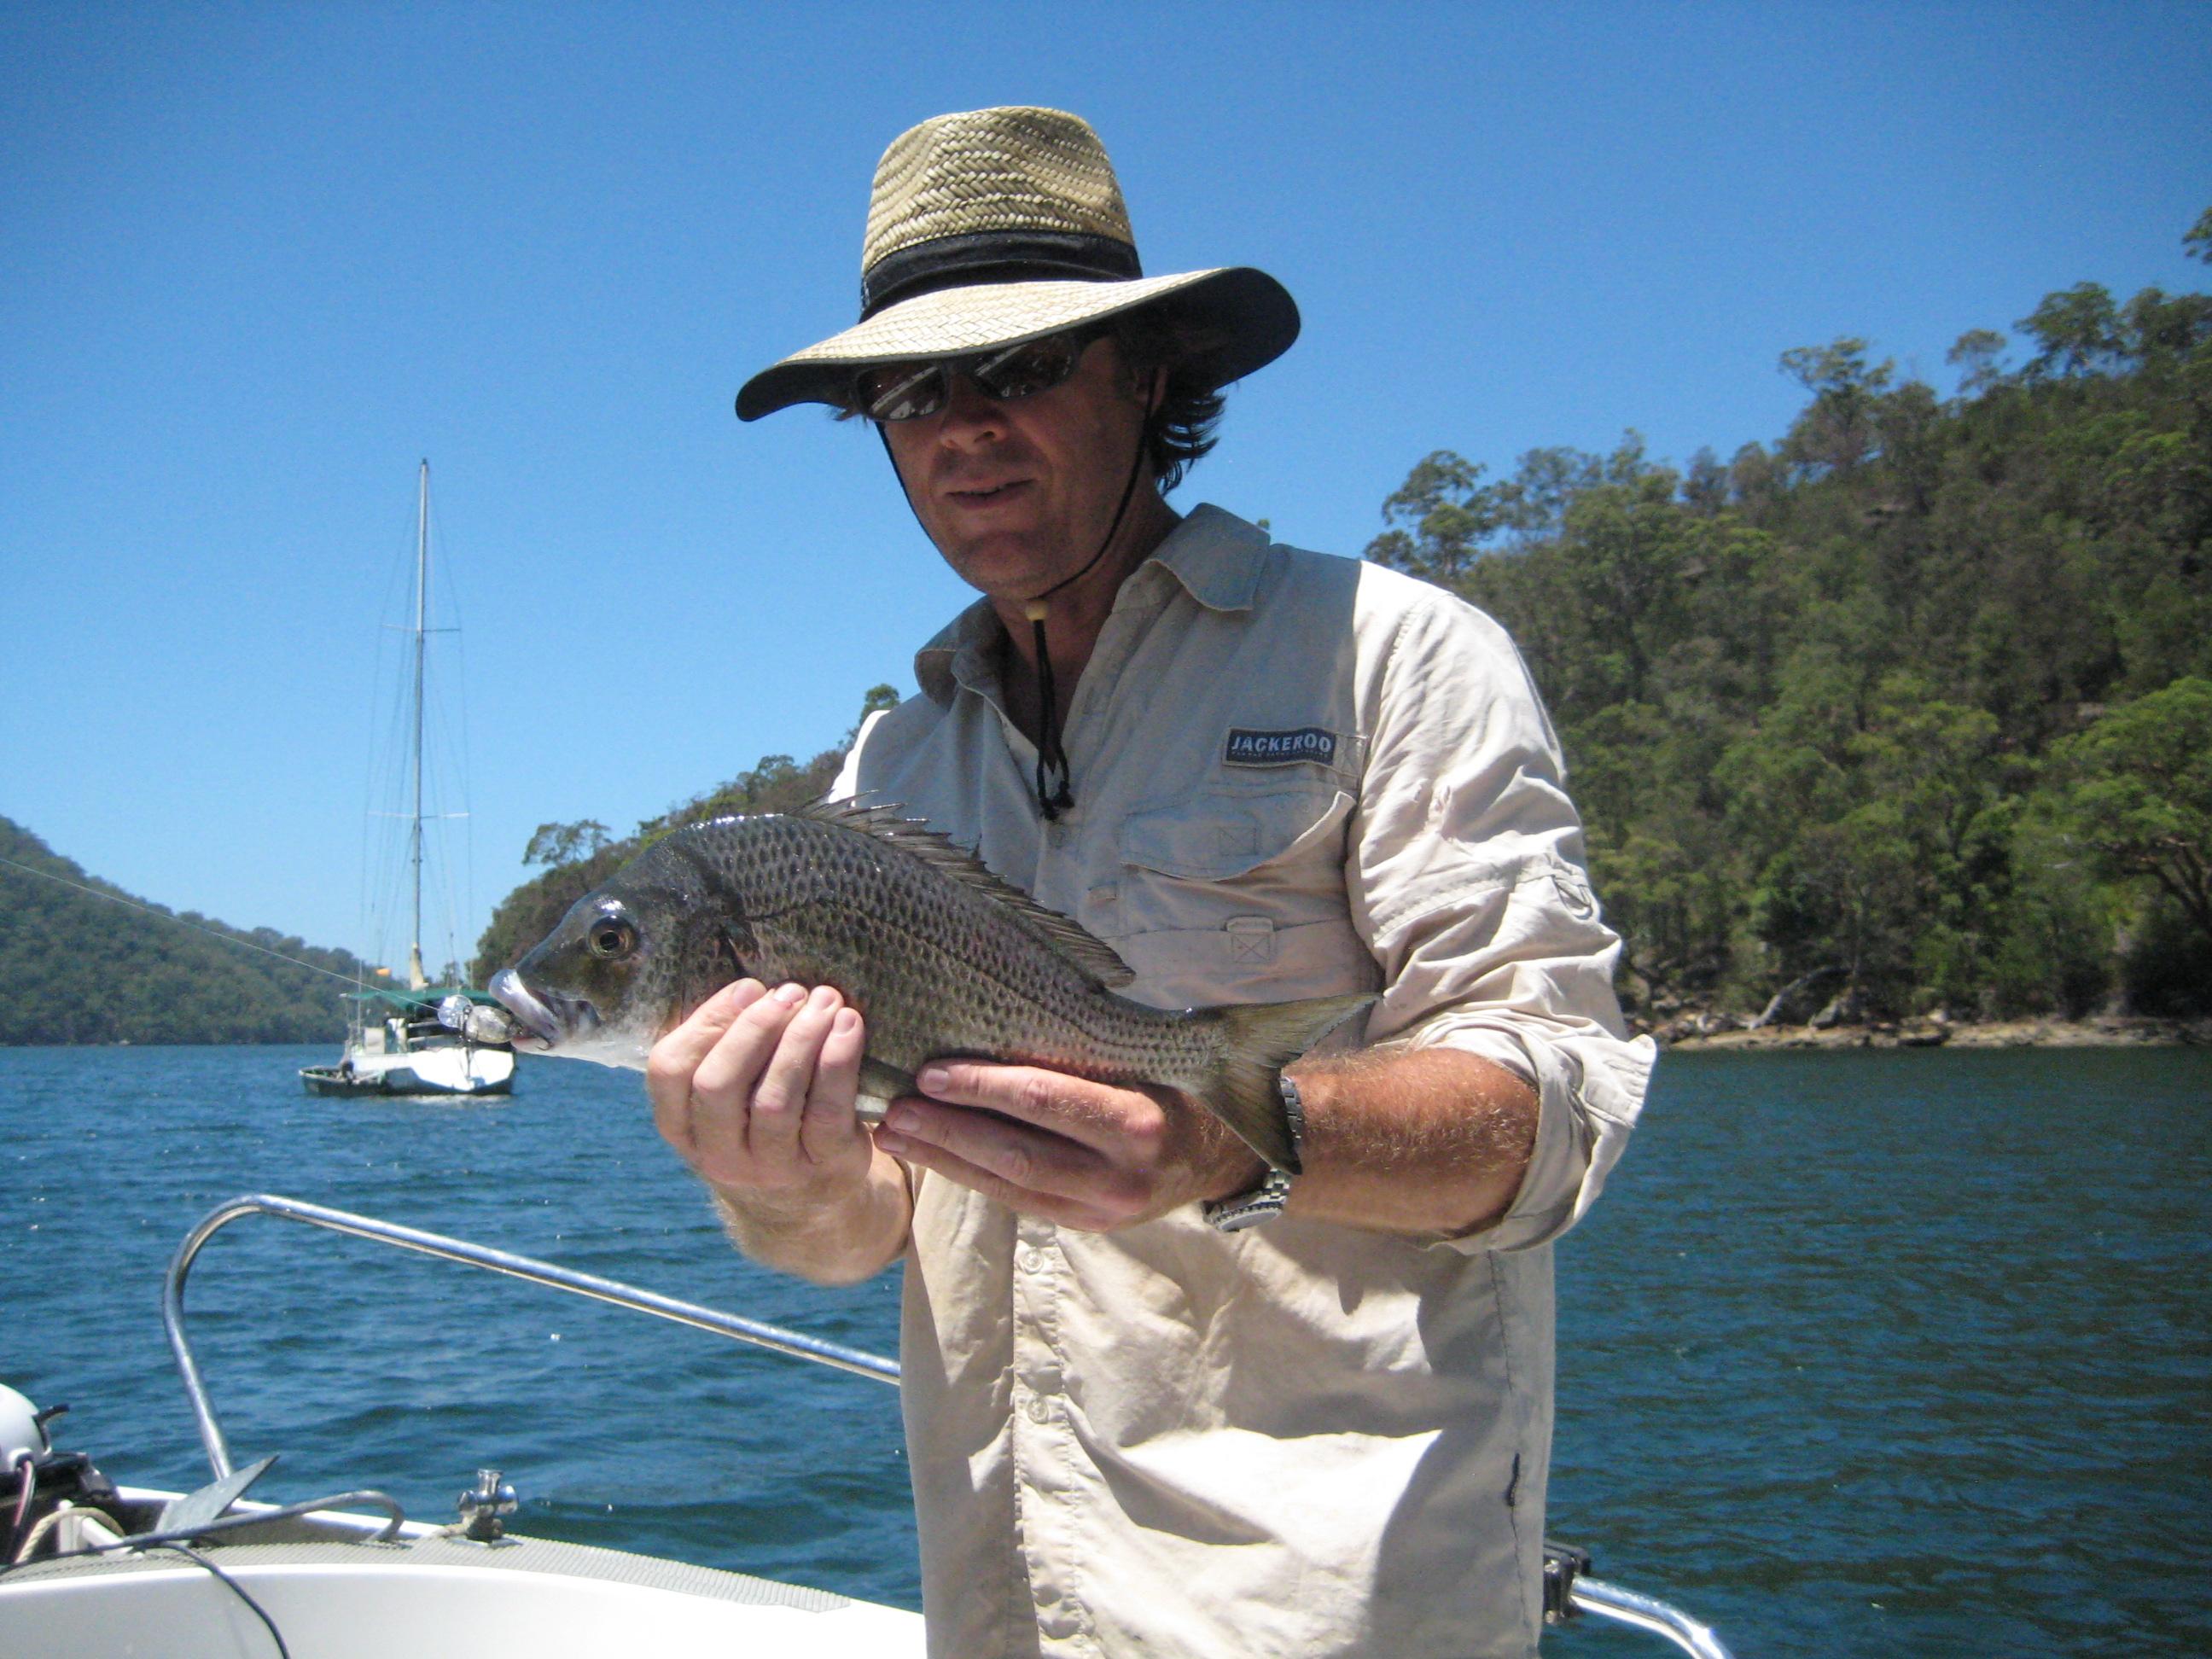 Desert island lures i fish therefore i am for Desert island fishing